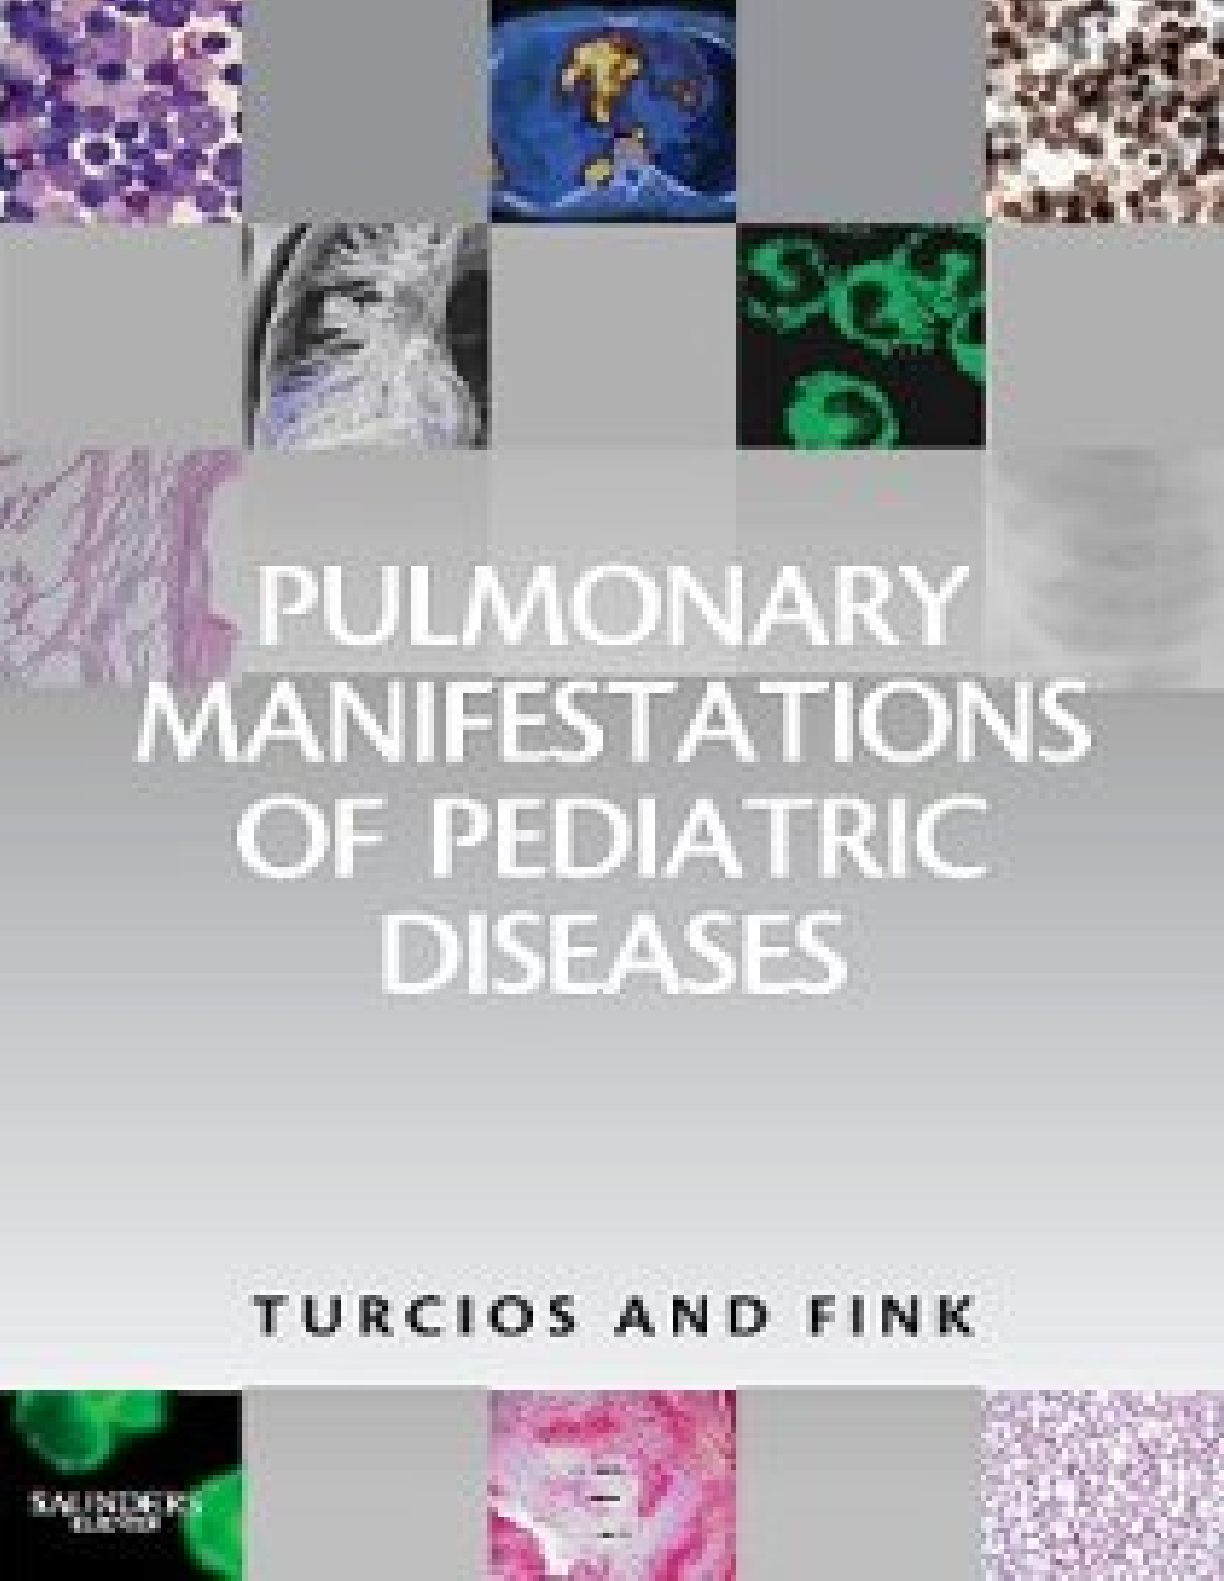 Canapé De Jardin Bois Beau Pulmonary Manifestations Of Pediatric Diseases [pdf Document] Of 38 Beau Canapé De Jardin Bois